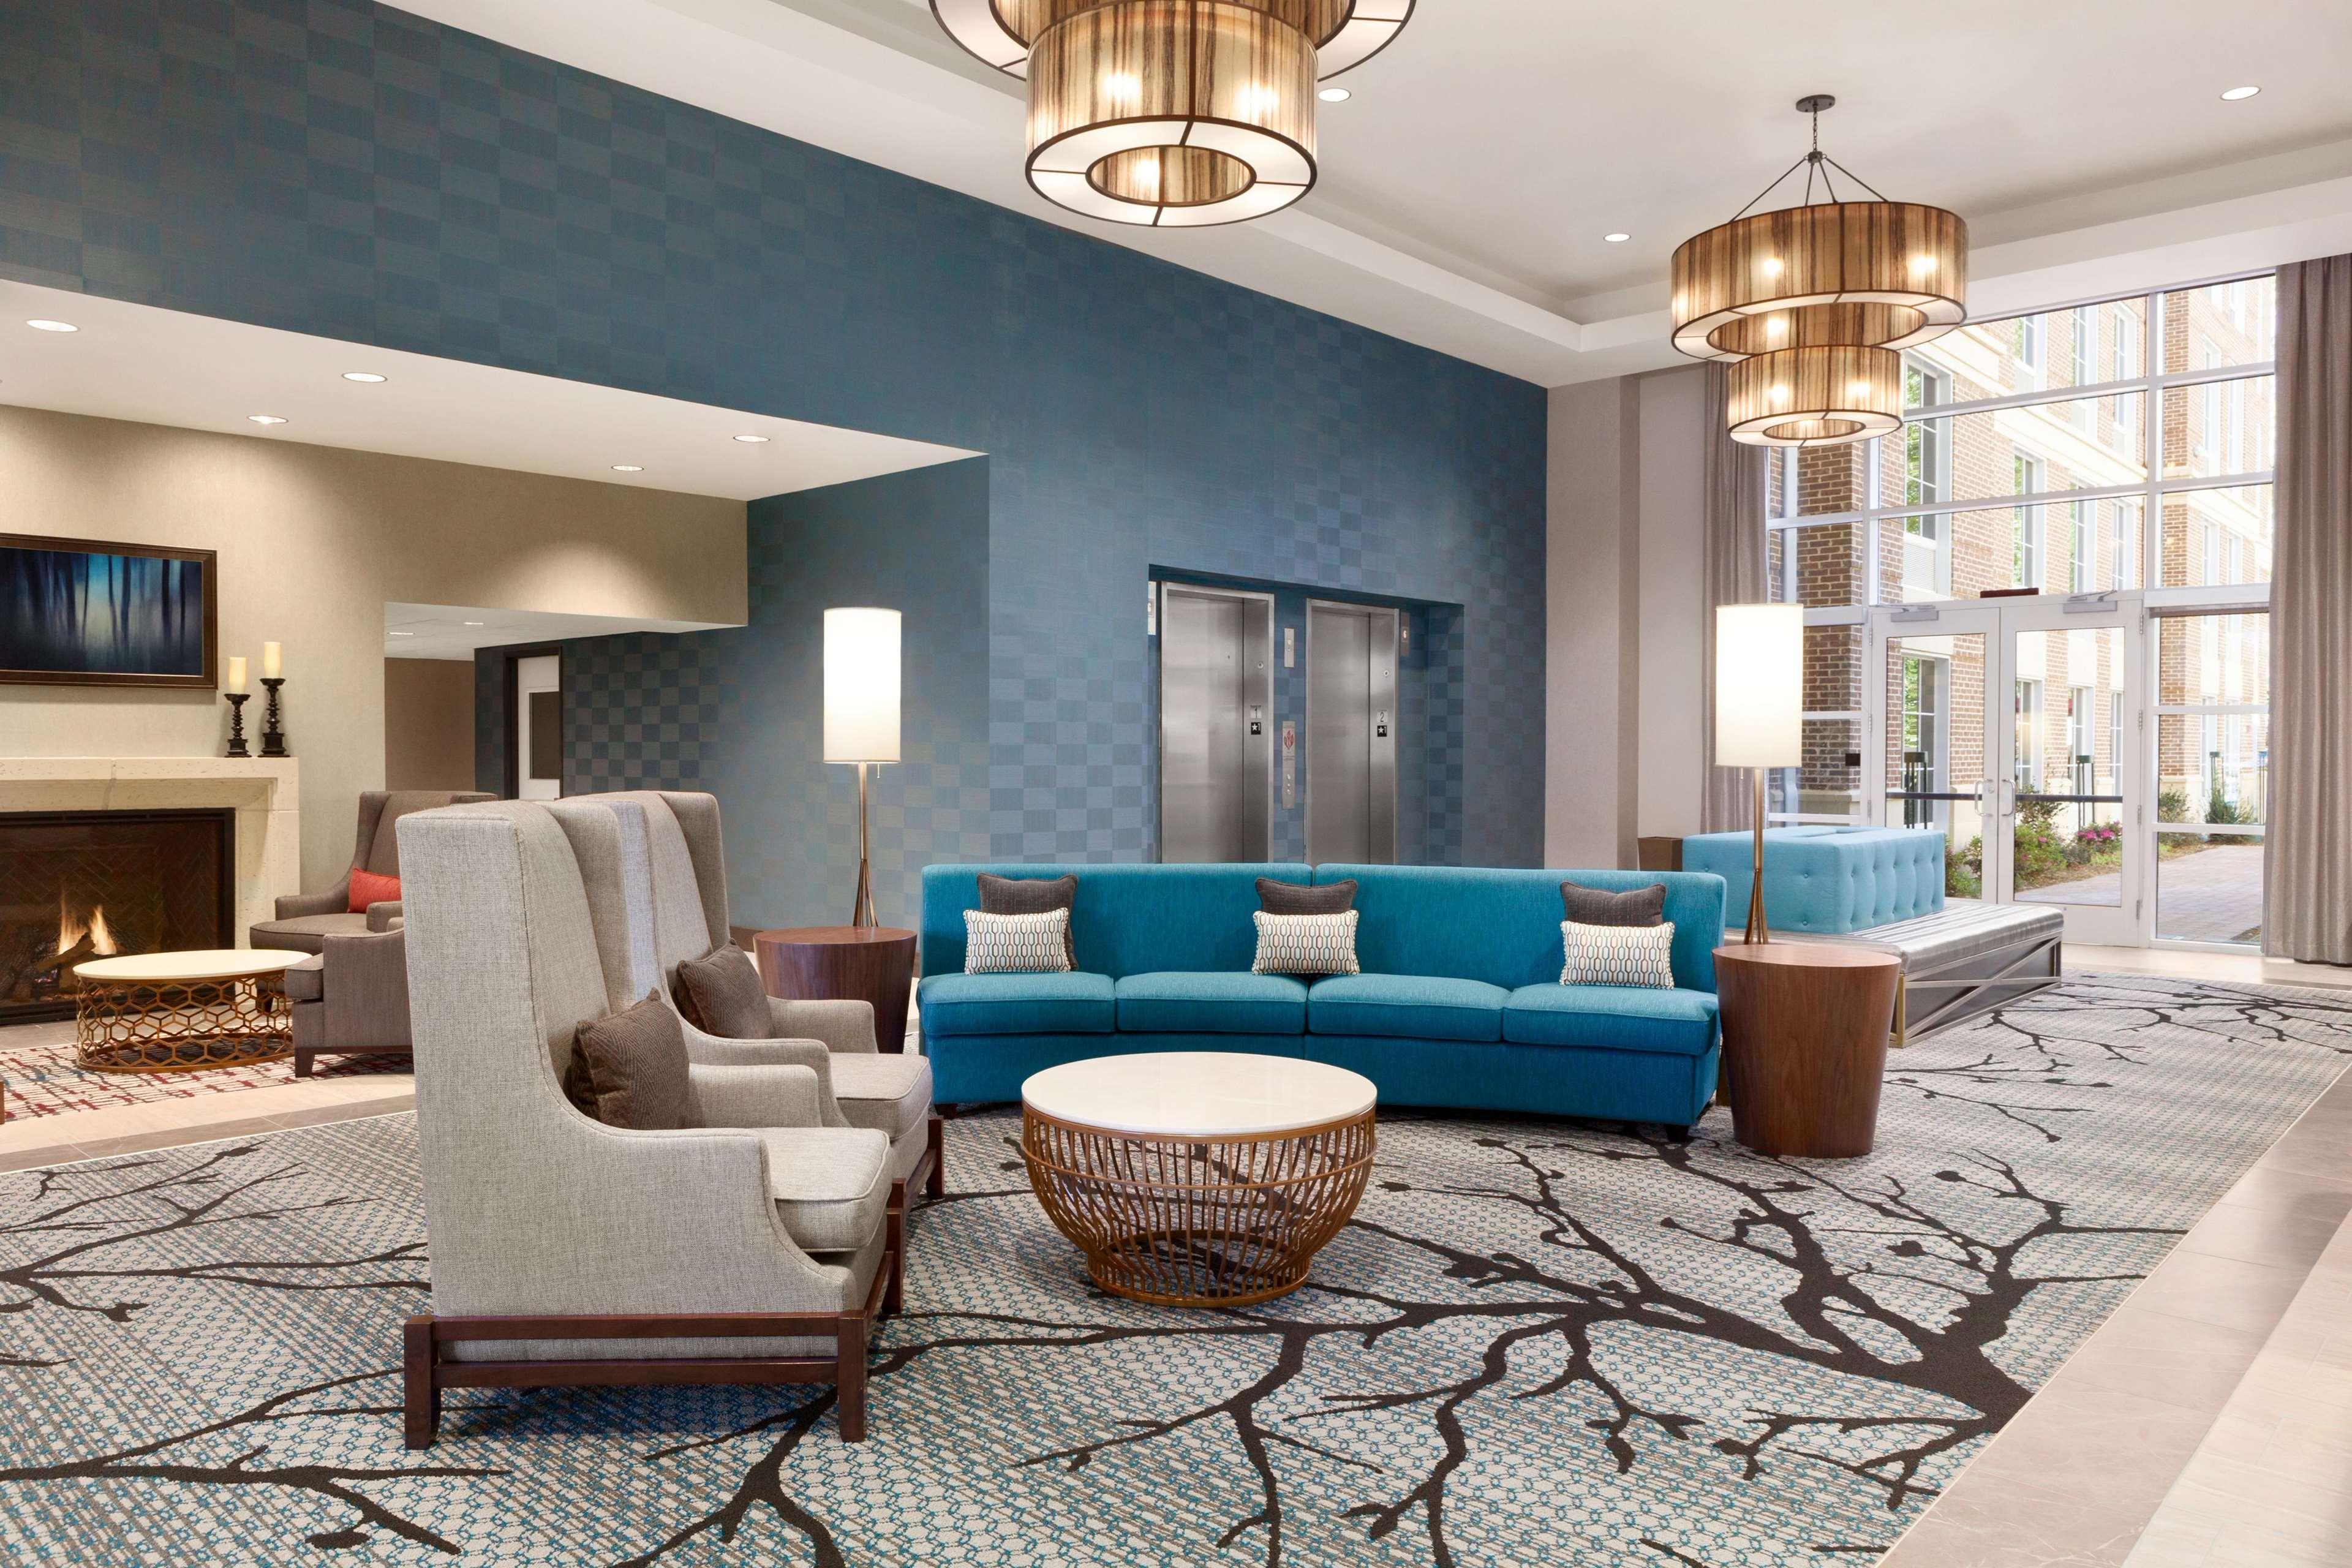 Homewood Suites by Hilton Charlotte/SouthPark image 35